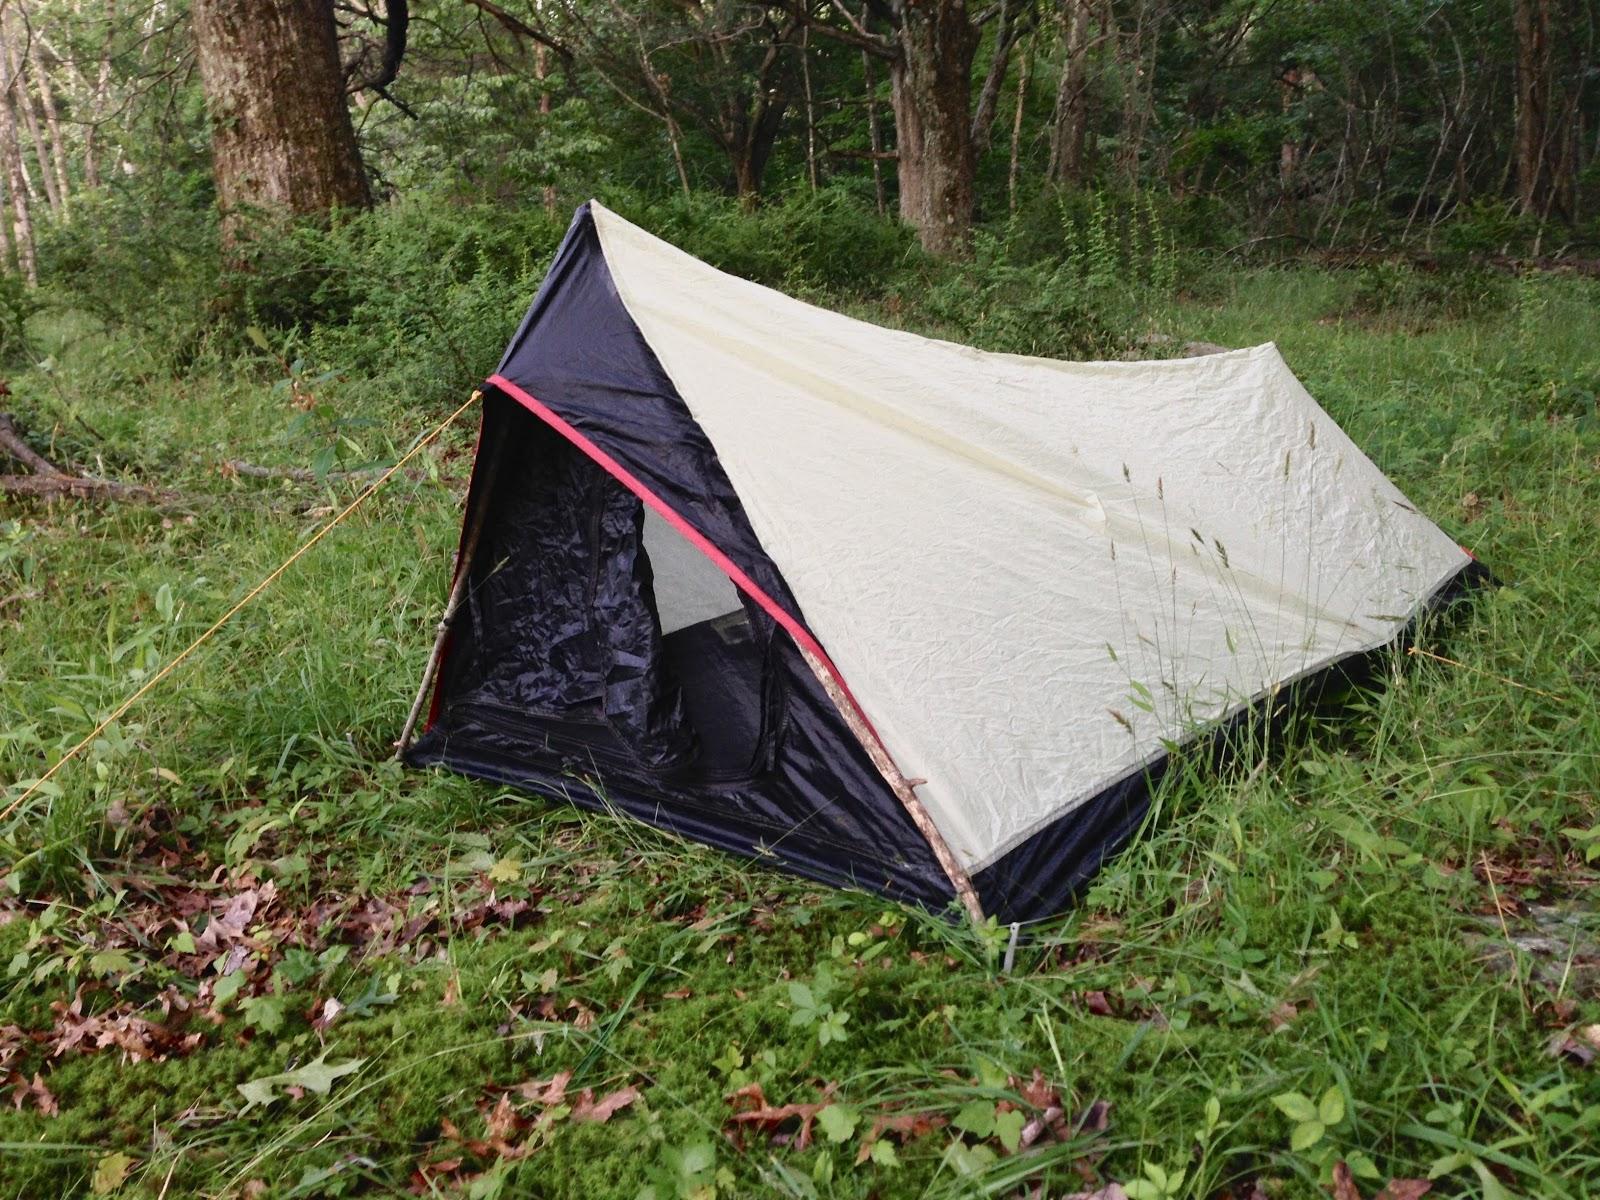 pup style trekking pole tent